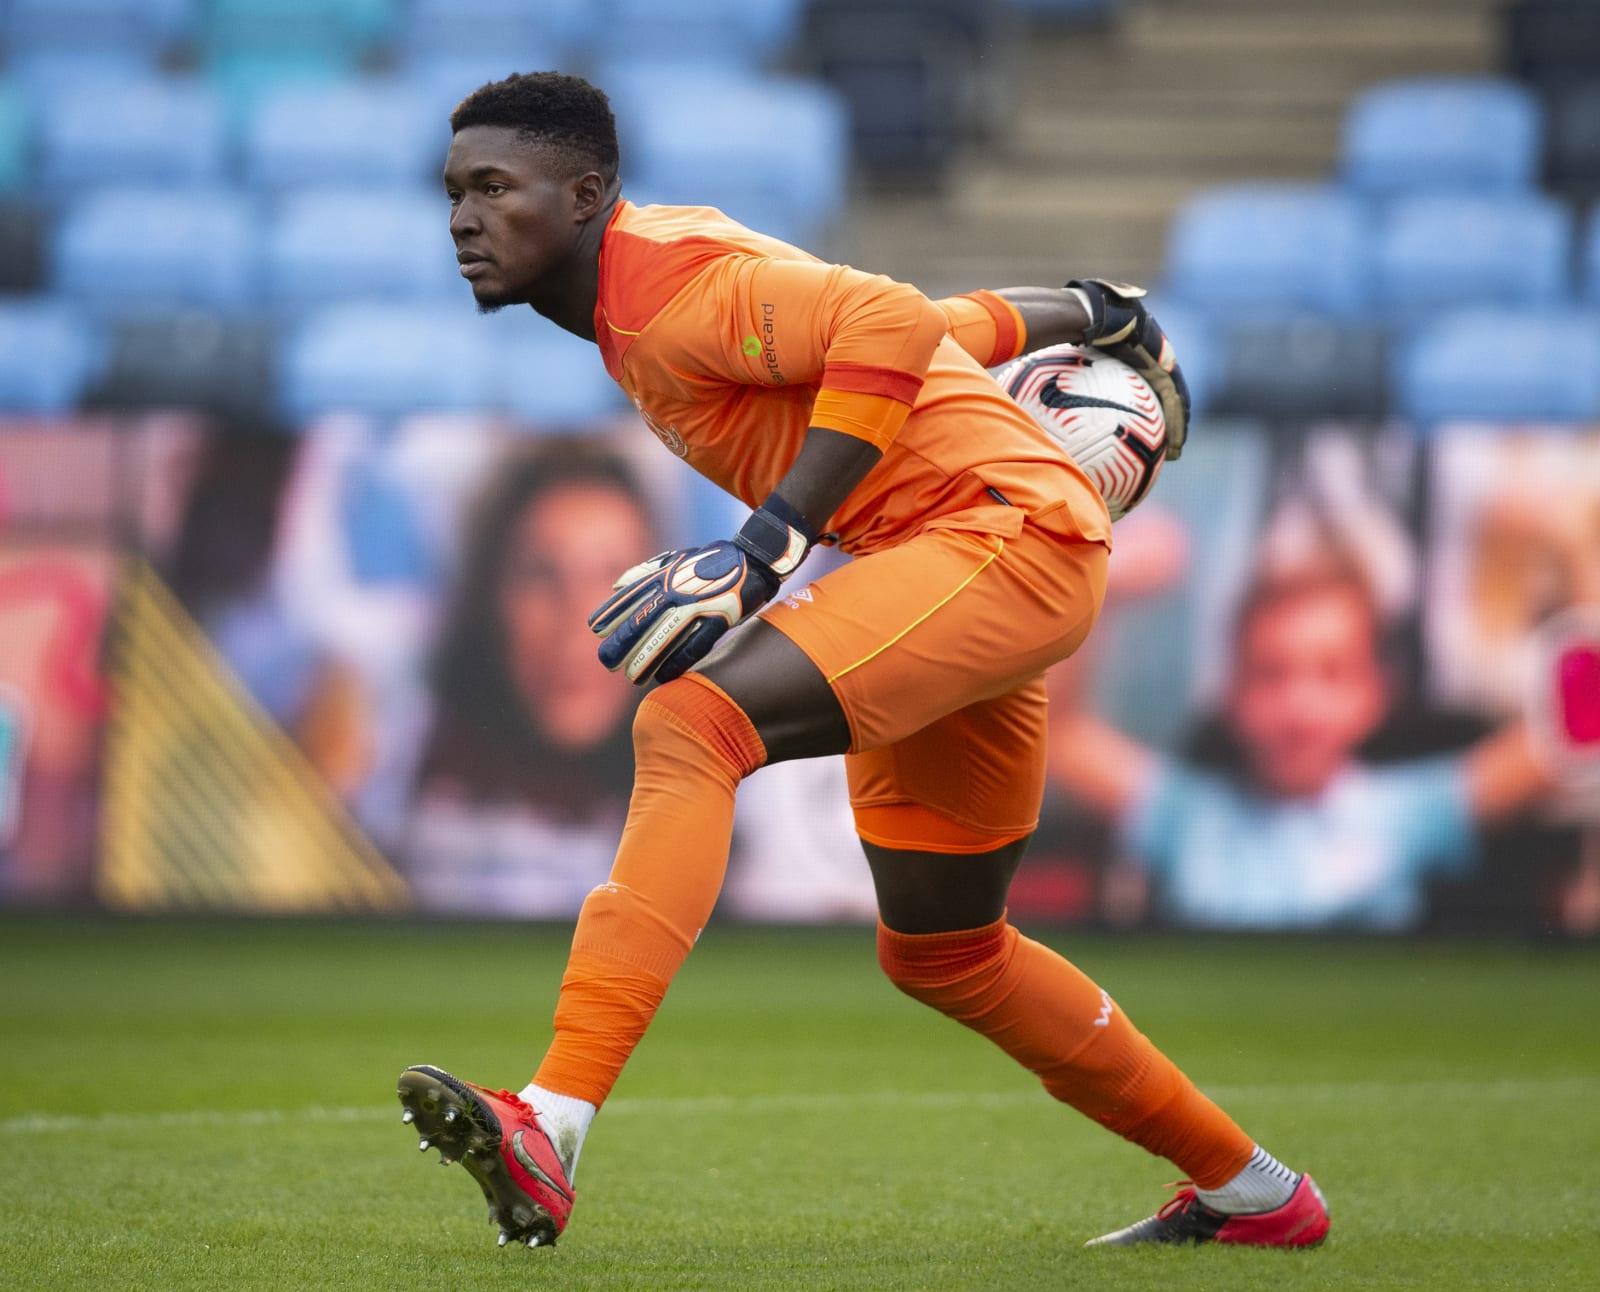 West Ham United goalkeeper Joseph Anang. (Photo by Joe Prior/Visionhaus/Getty Images)